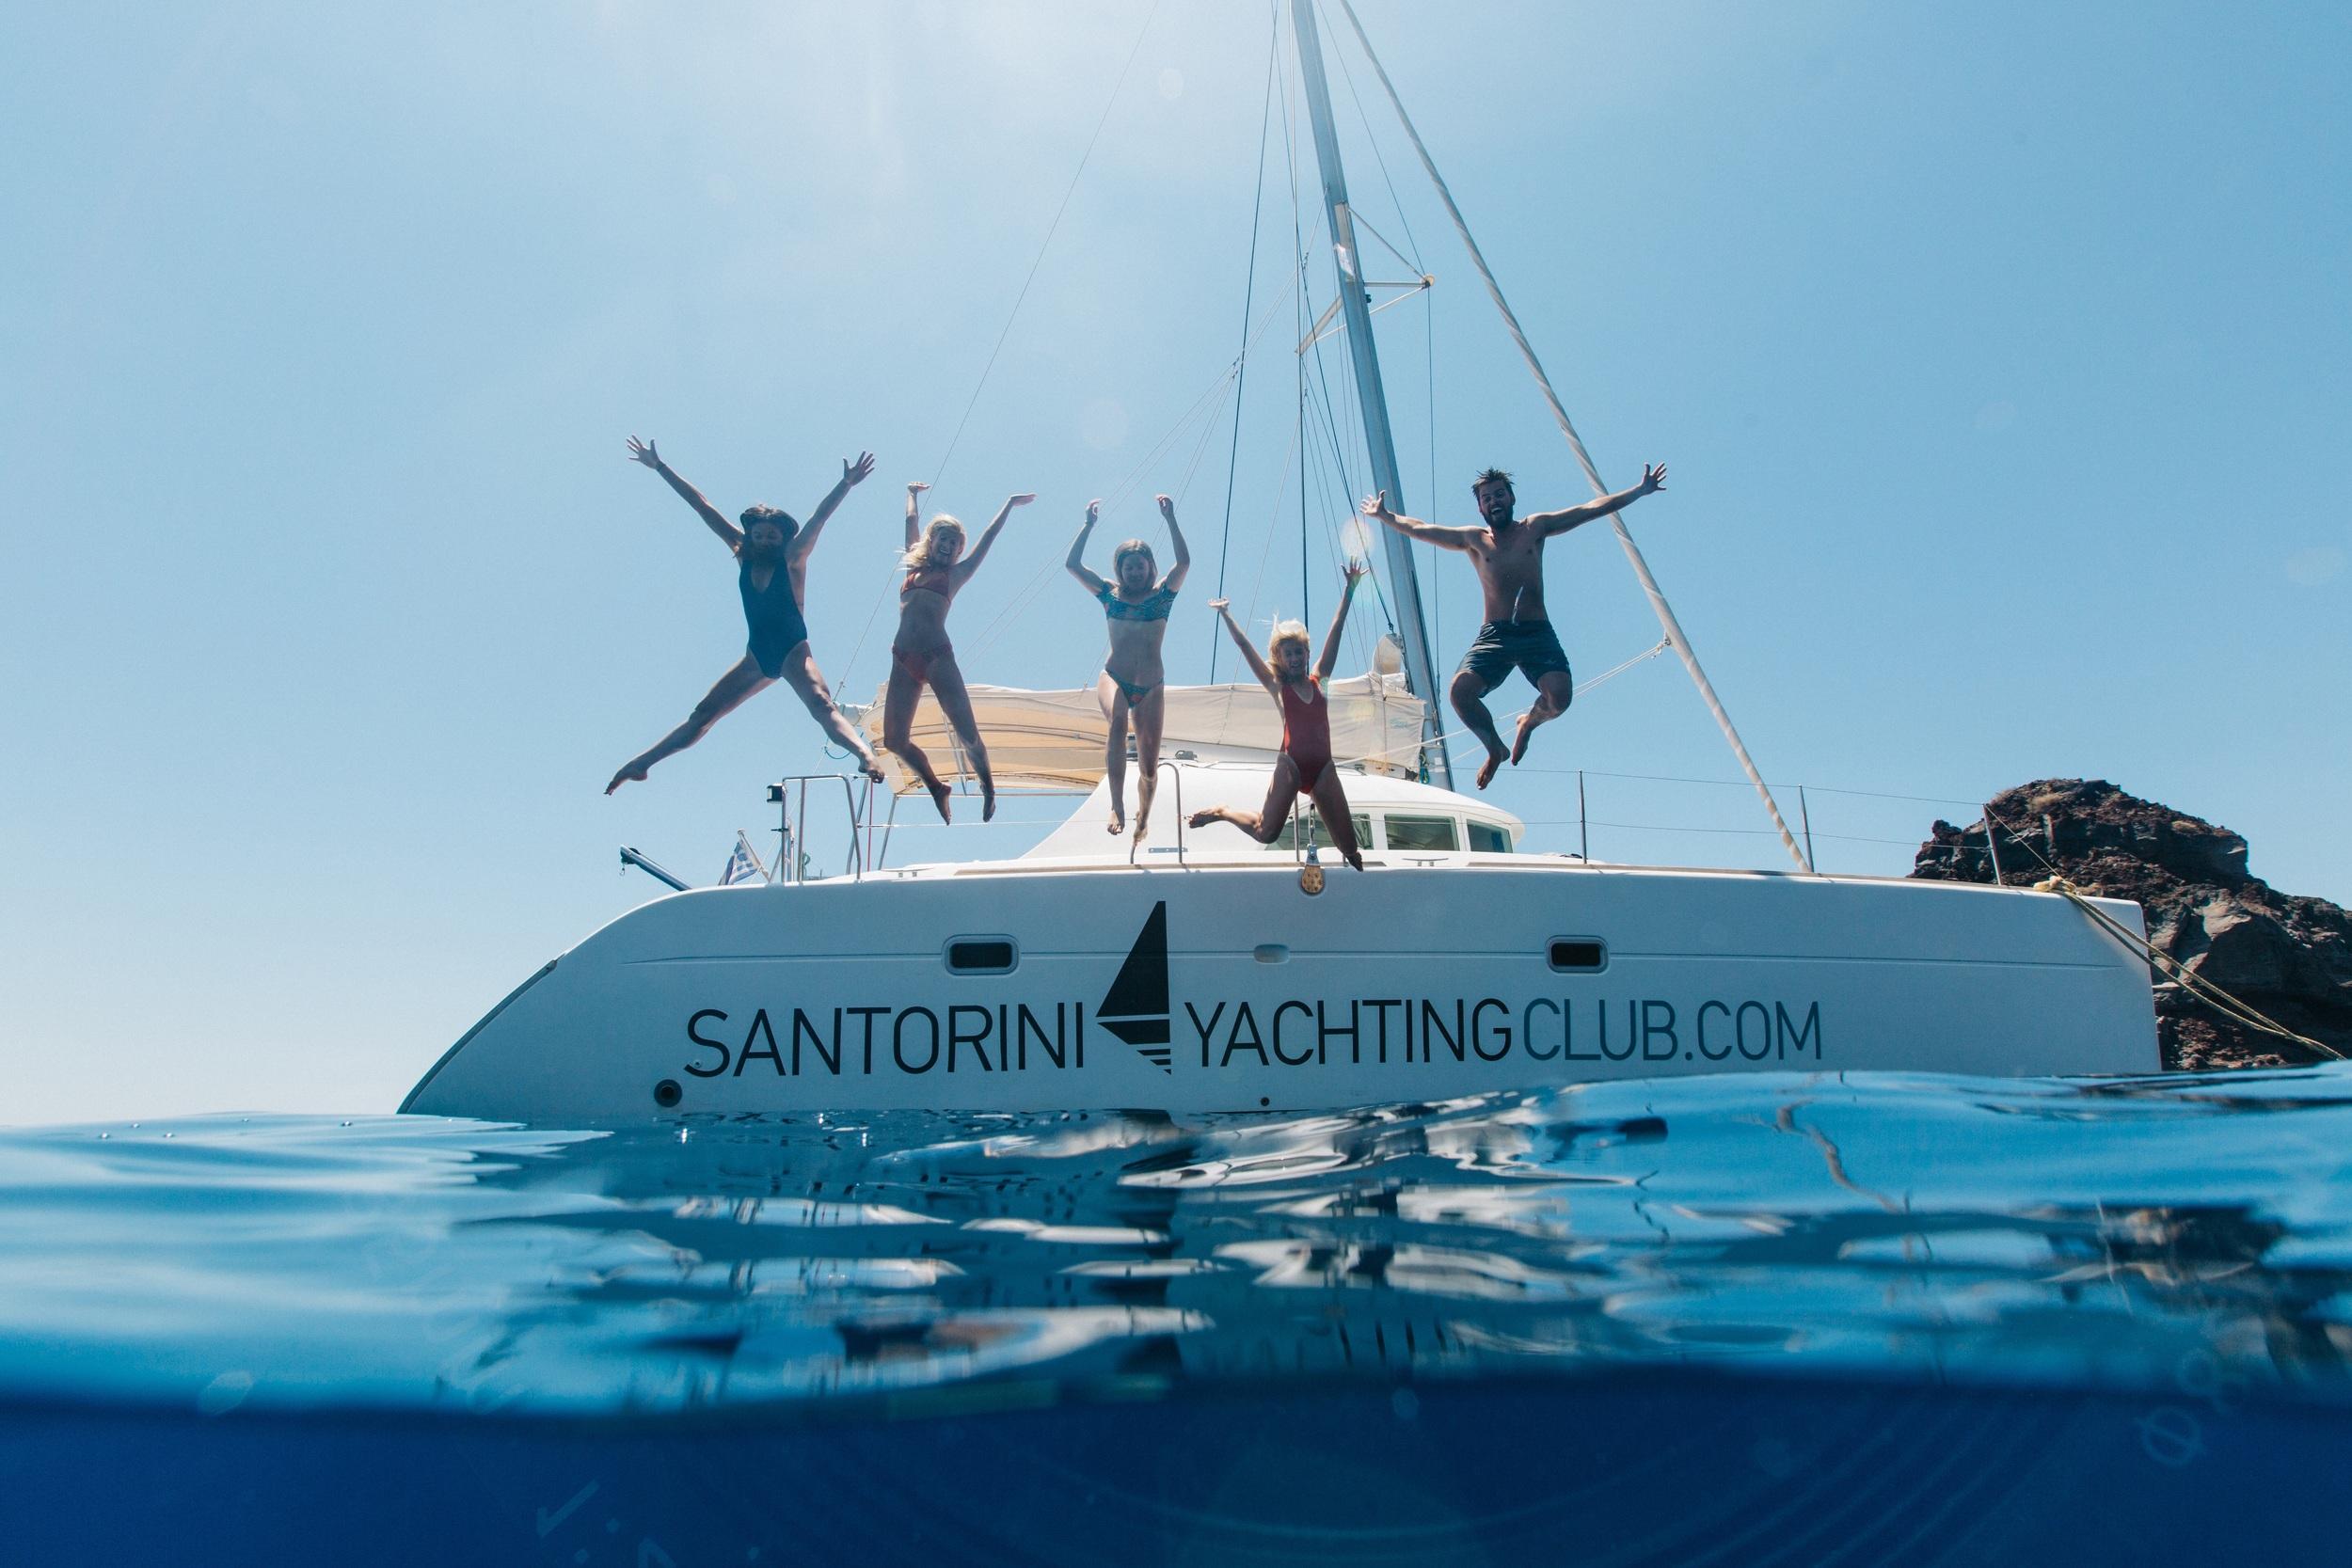 Santorini sailing: Part 1